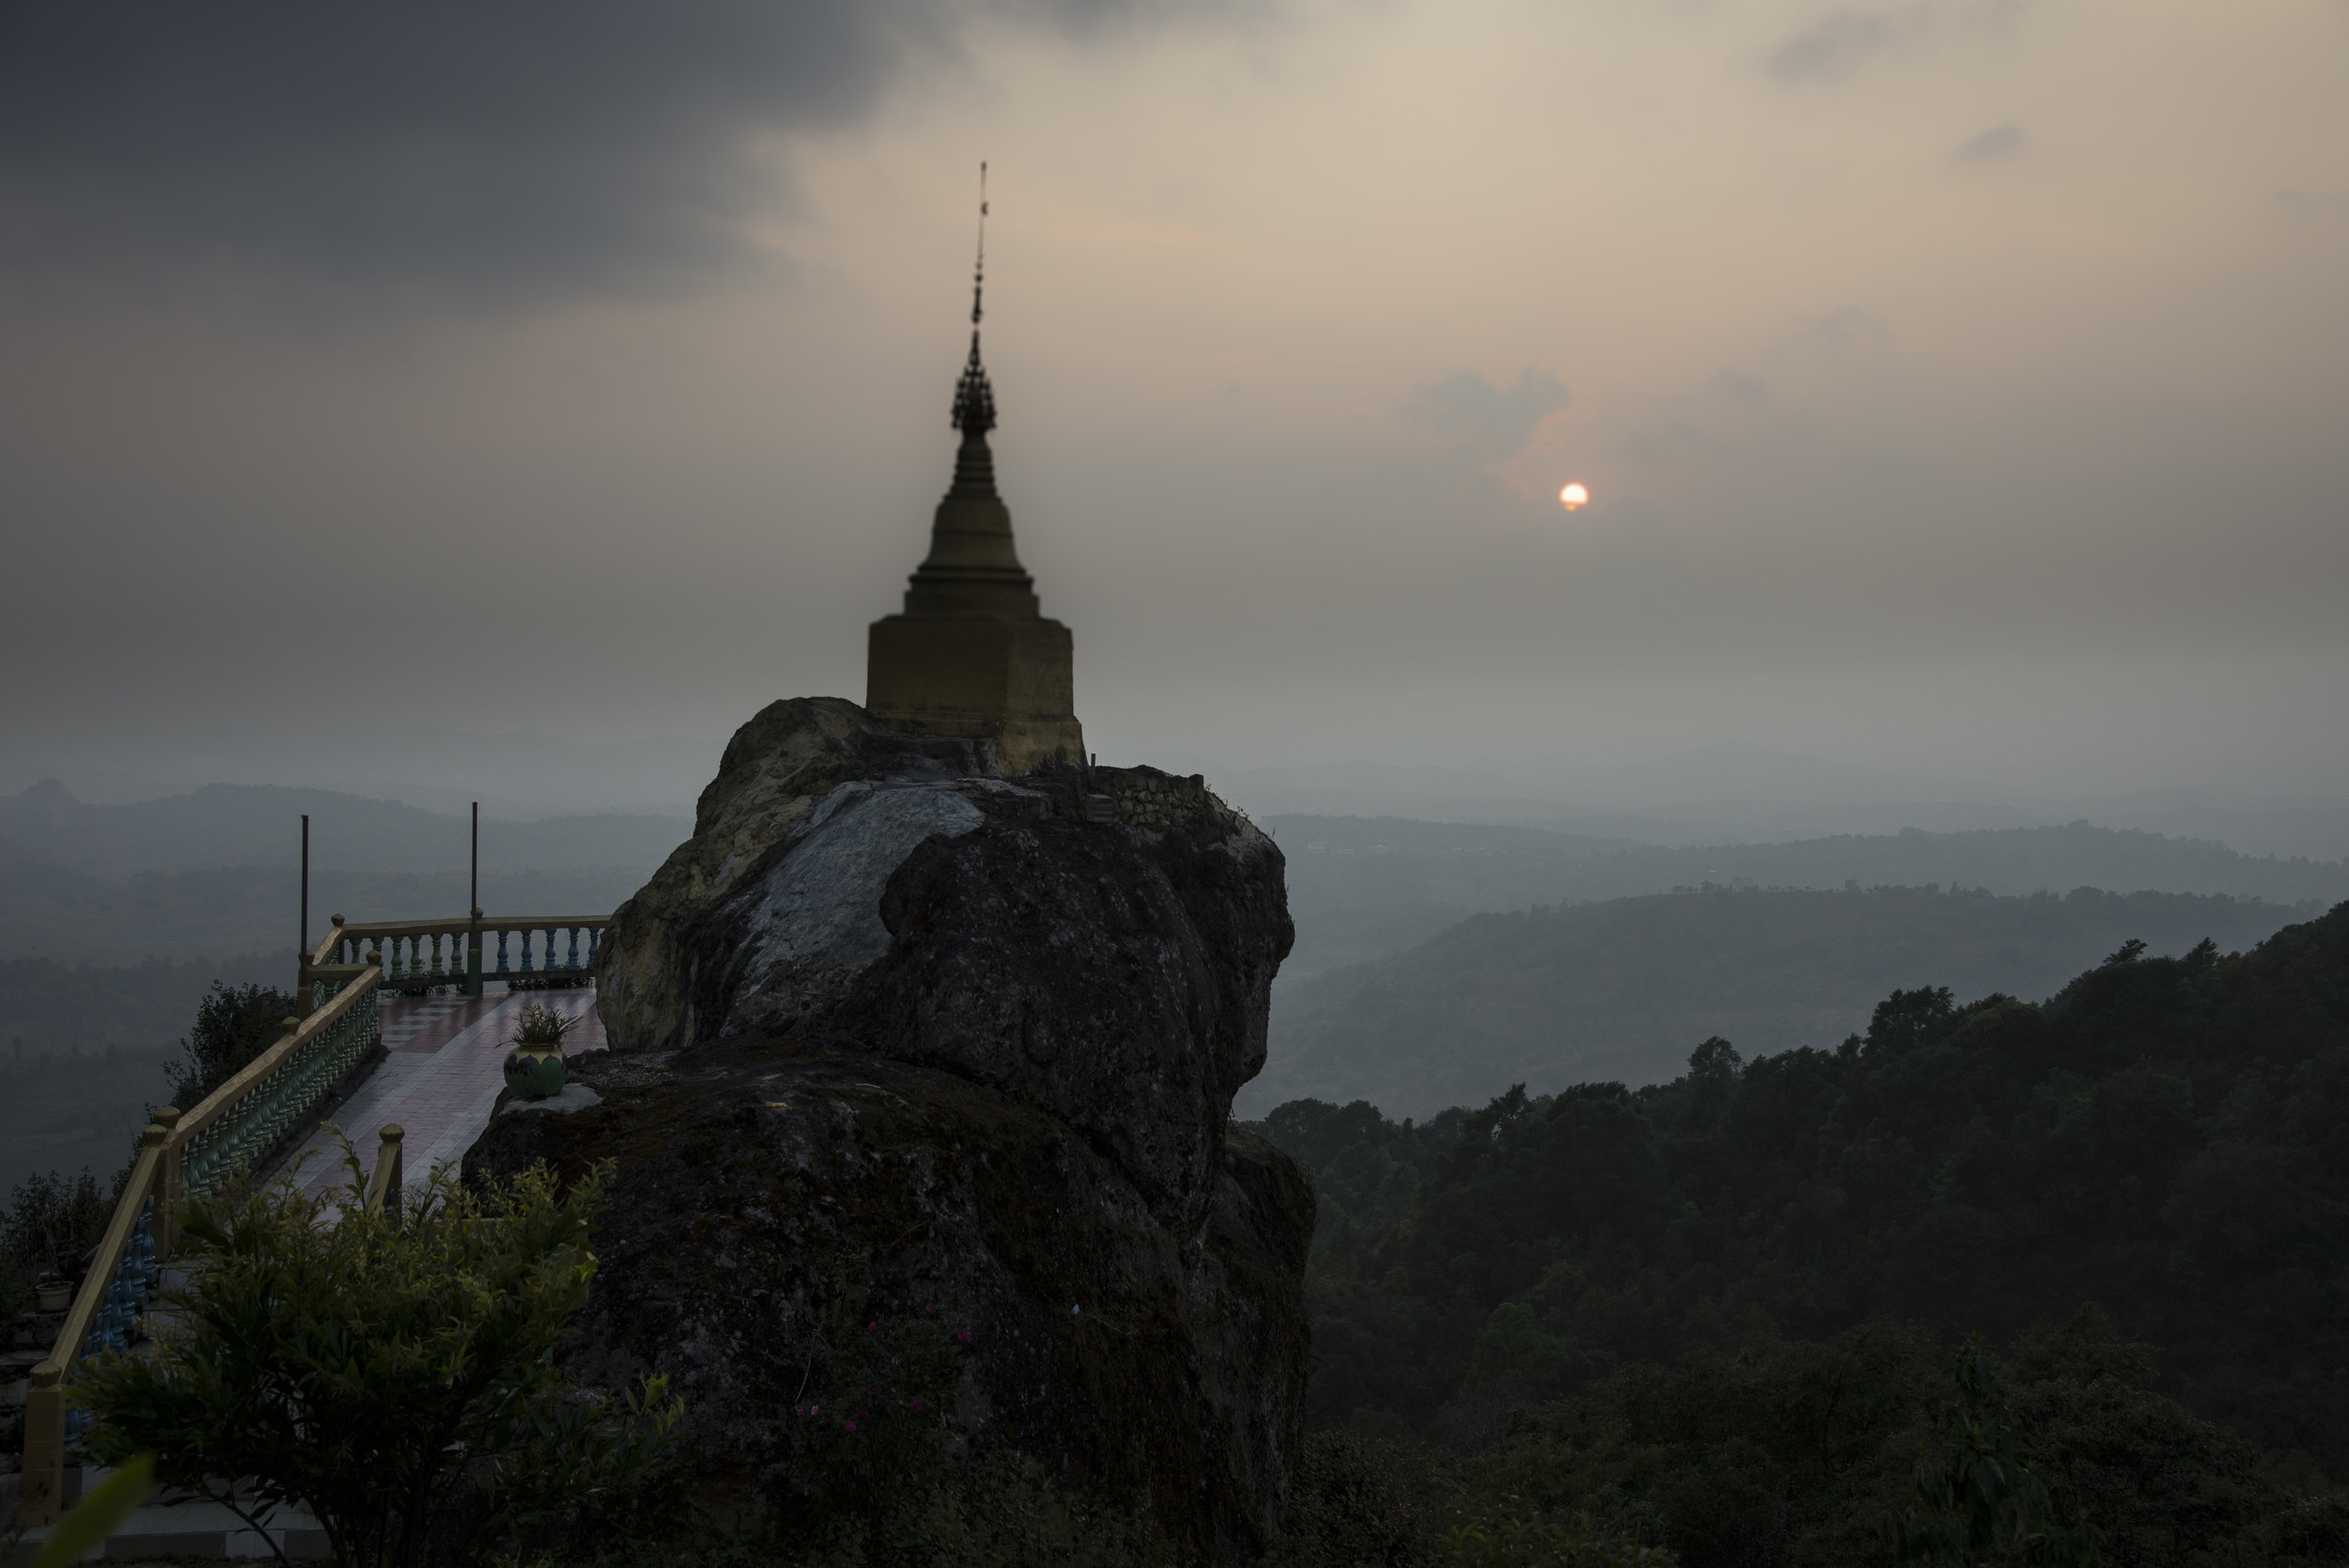 _4.23 Mountaintop Pagoda, Myanmar.jpg